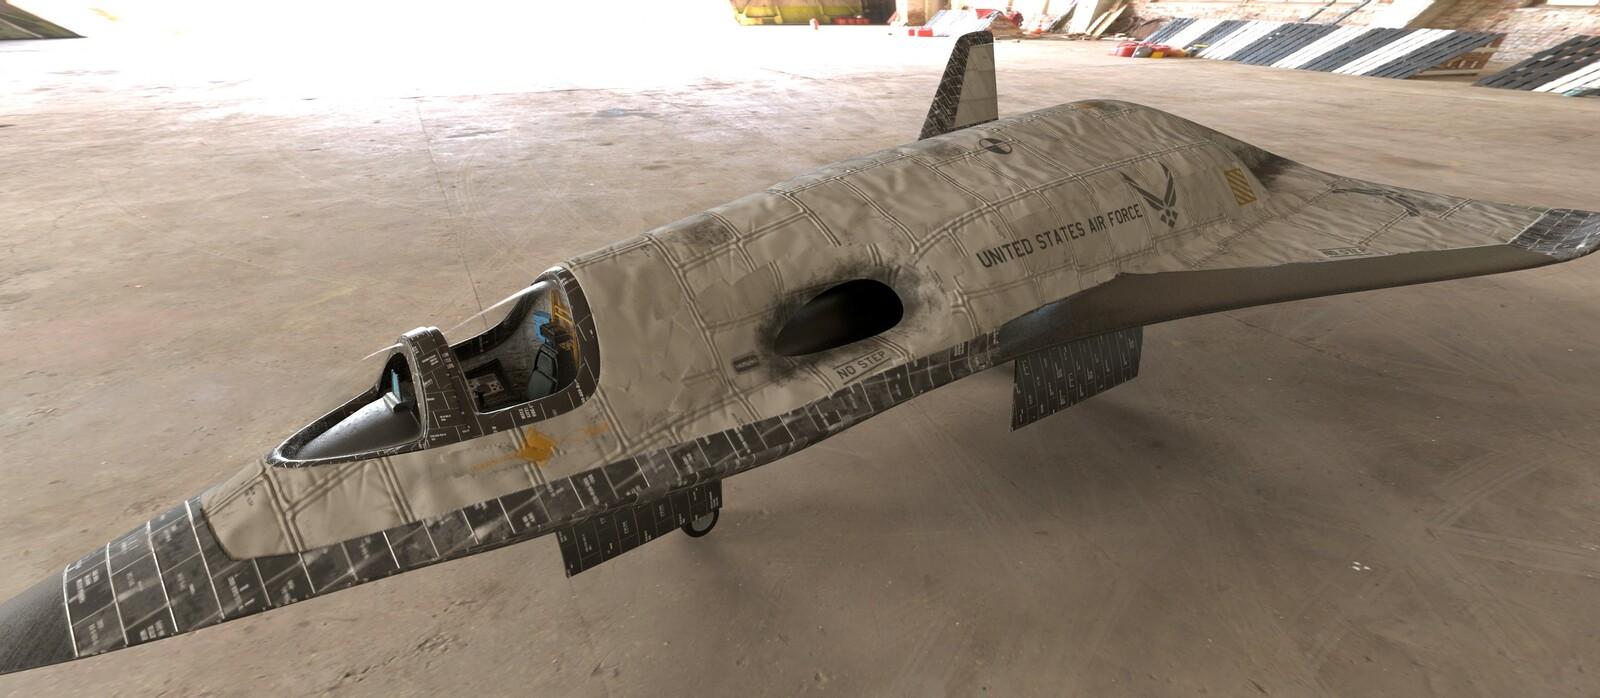 F-295 Military LEO Concept Fighter